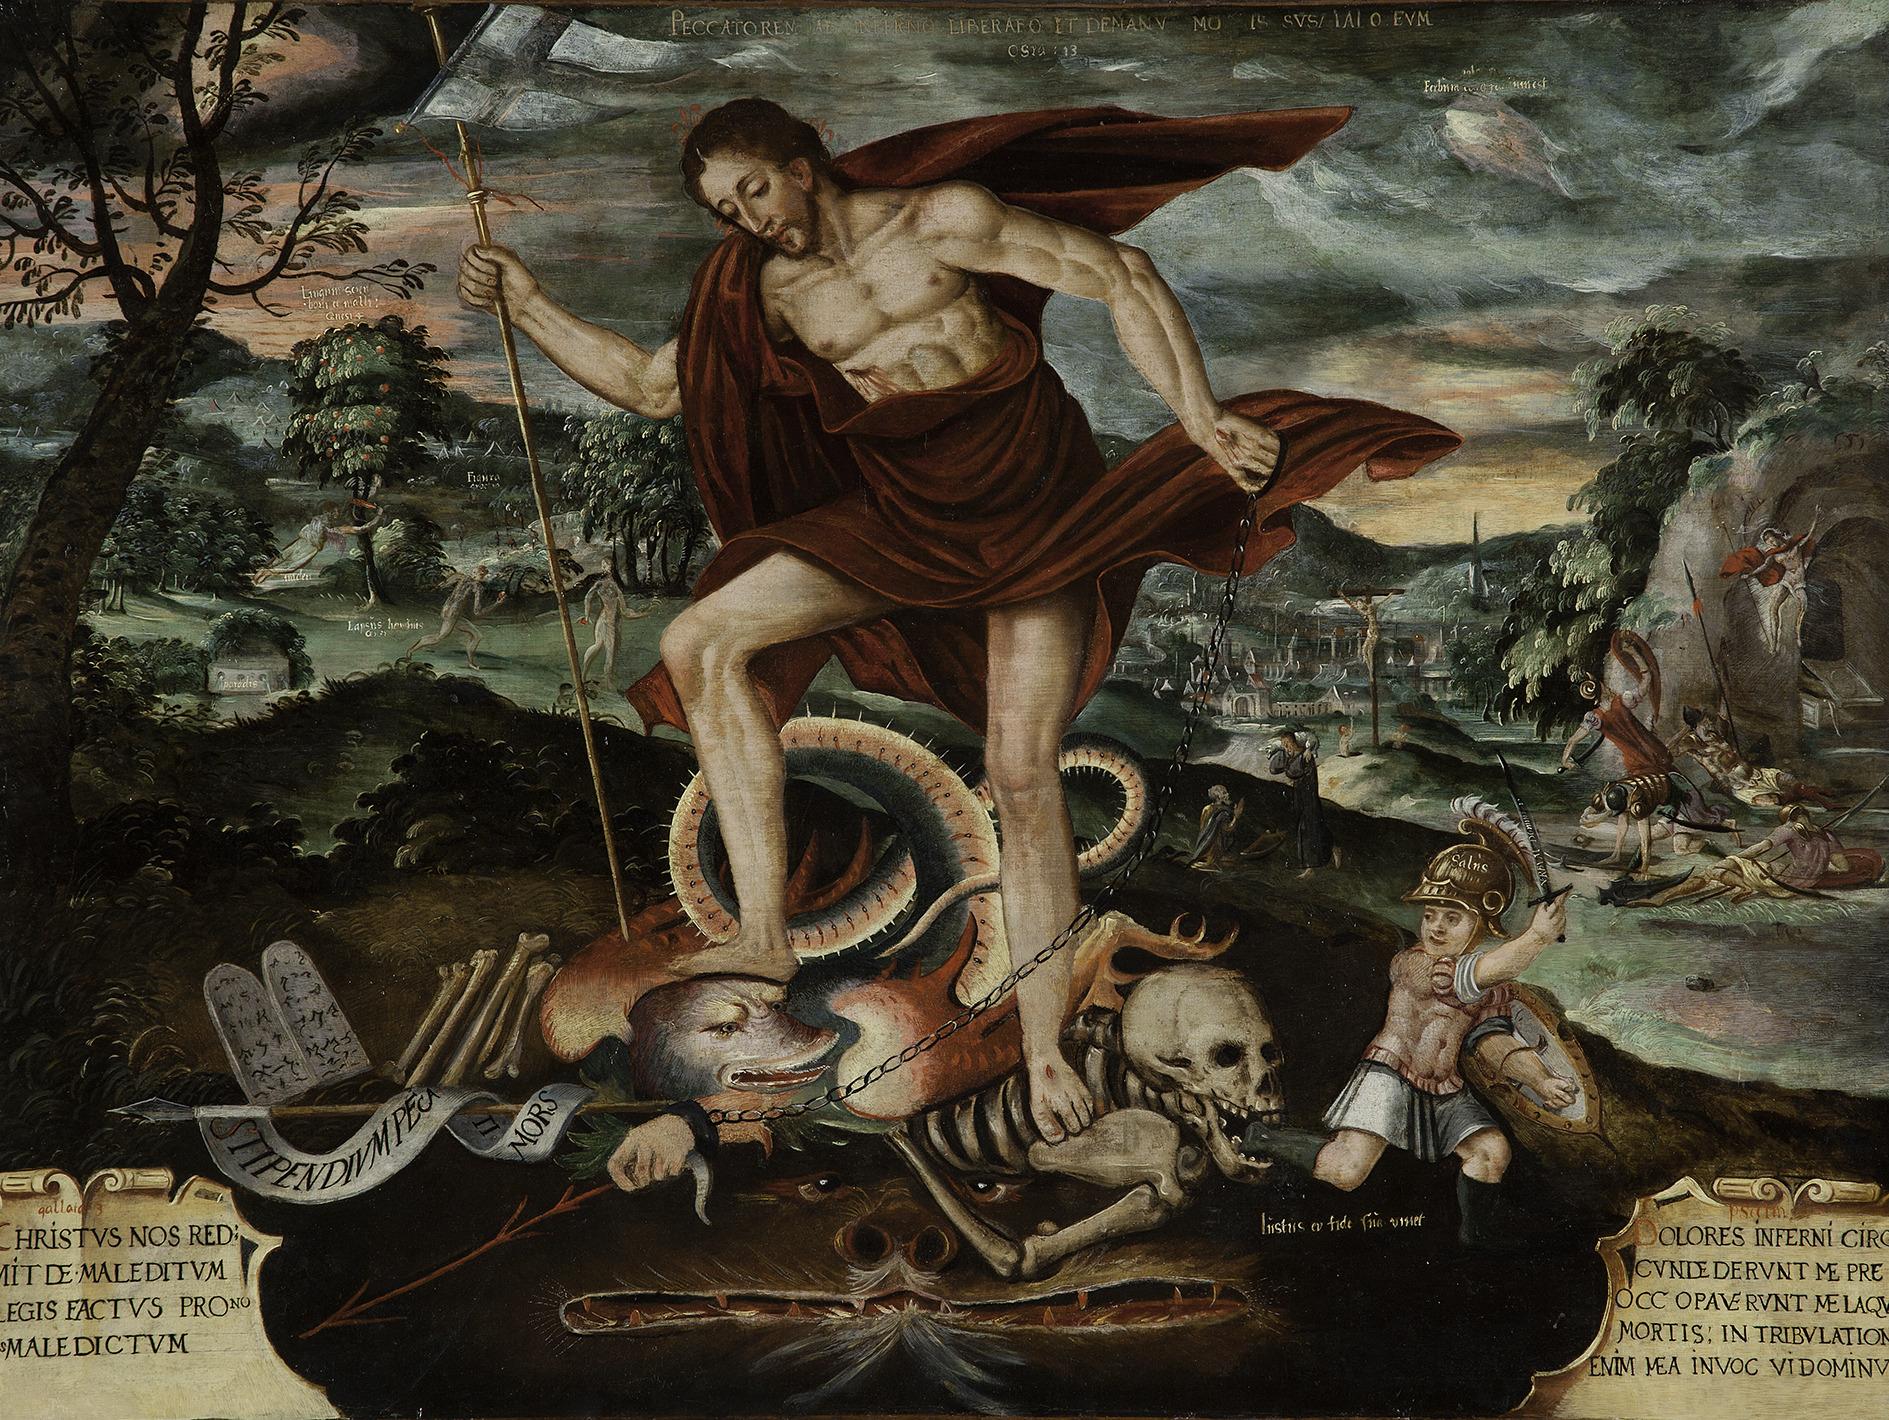 Christ Descending into Hell